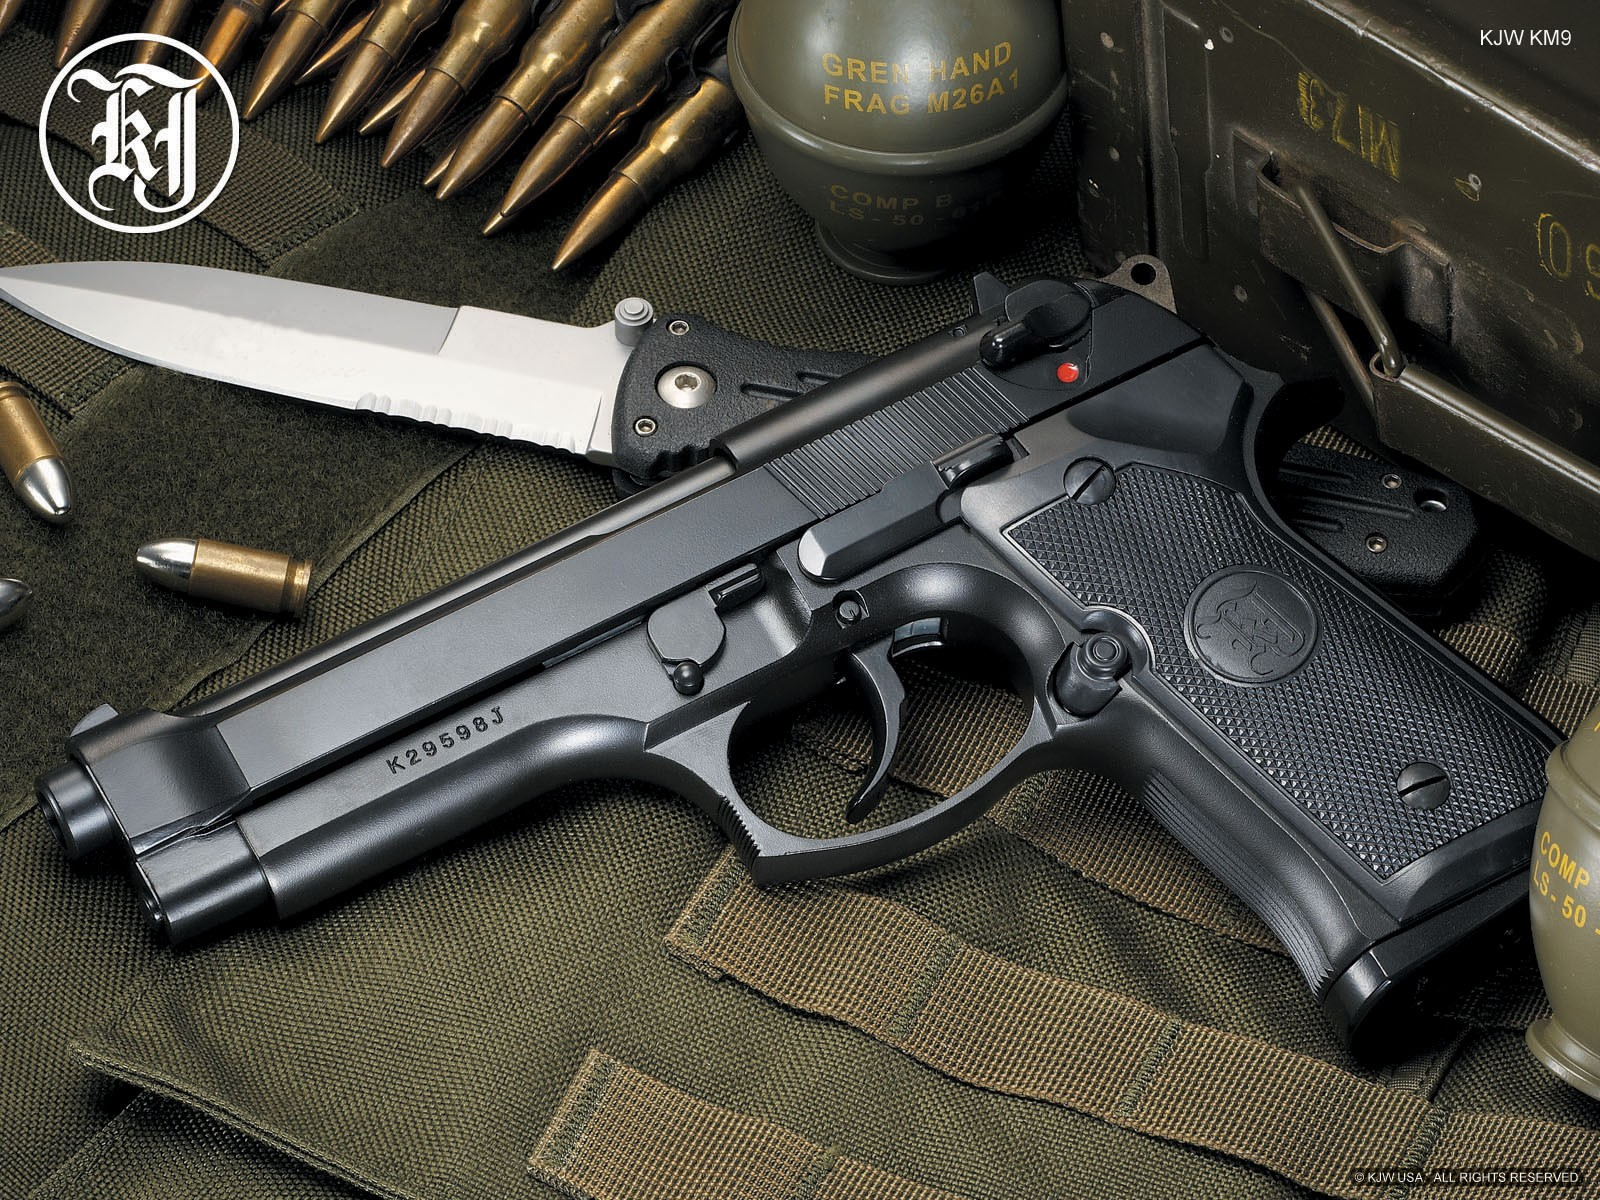 Pistols Guns Wallpaper 1600x1200 Pistols, Guns, Weapons, Knives ...